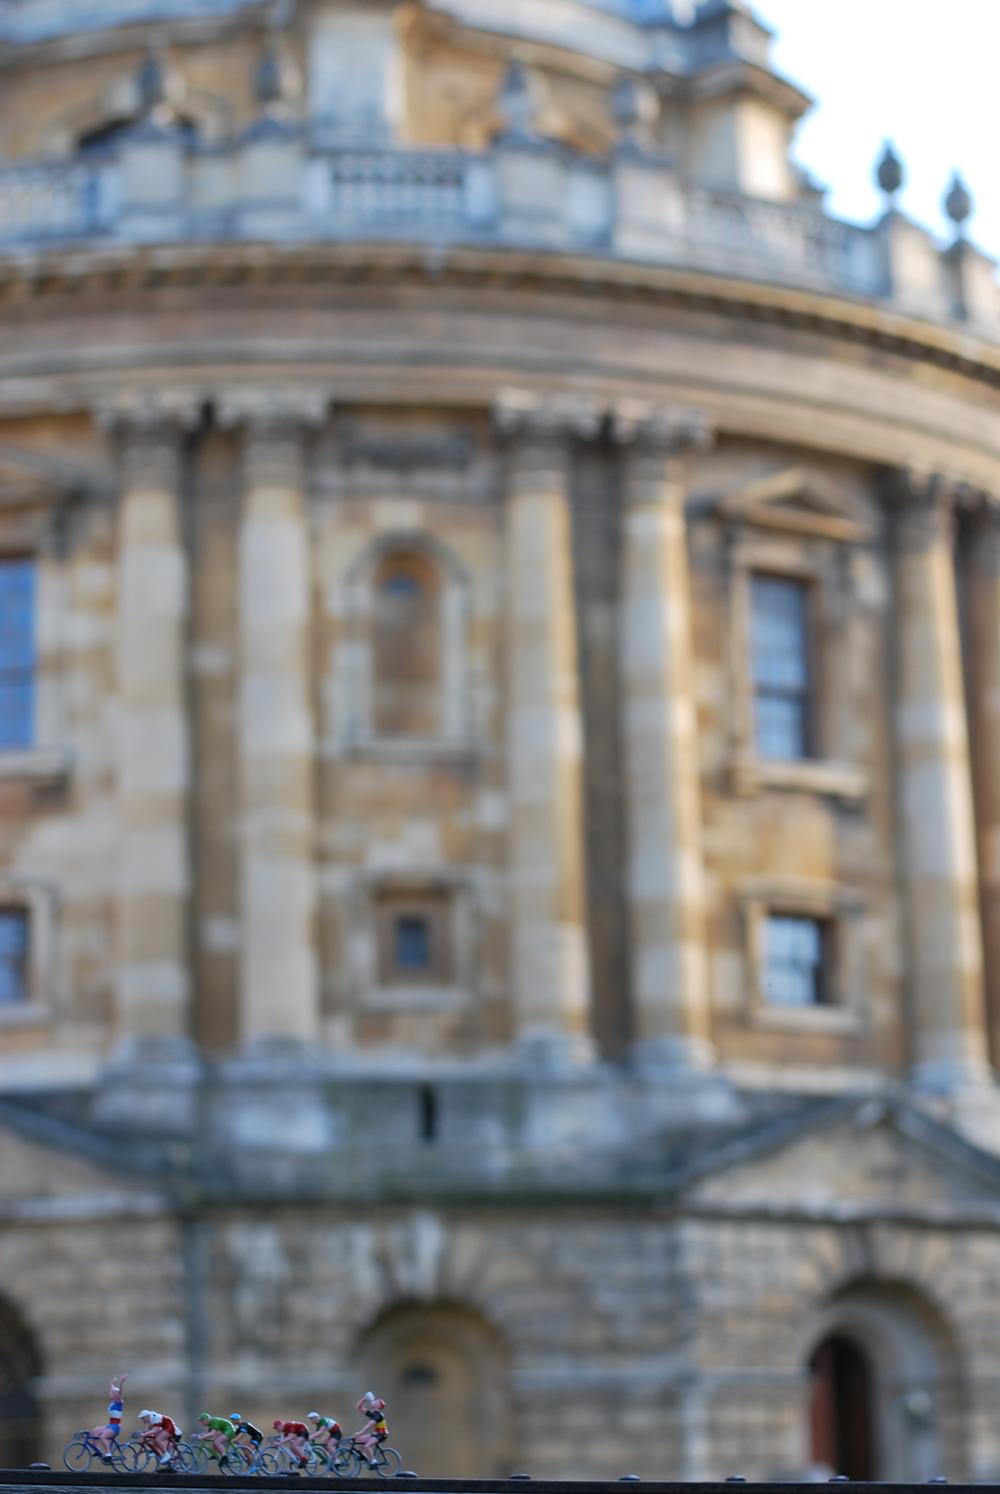 Radcliffe Camera, Oxford, UK